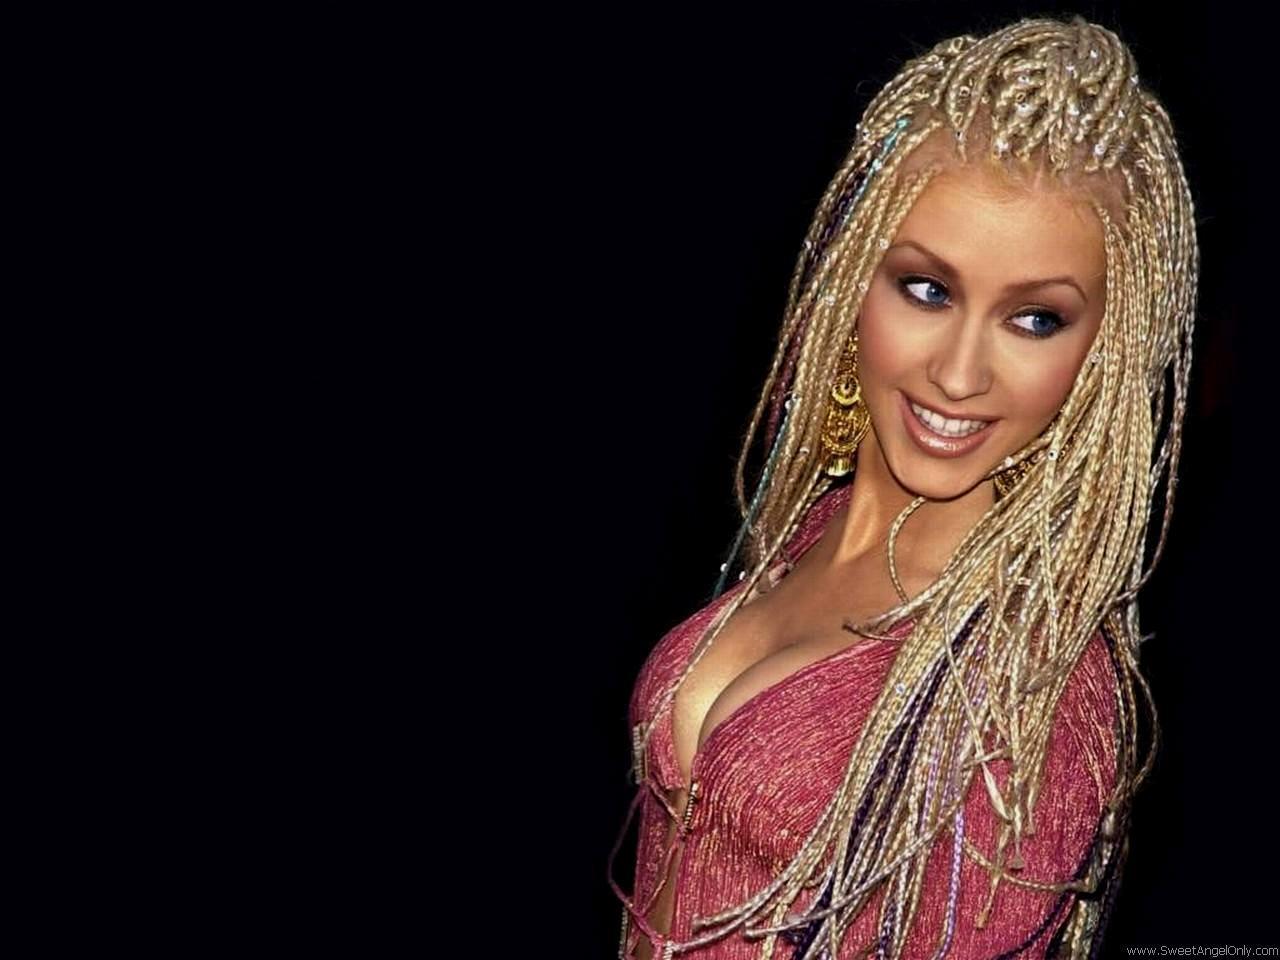 Christina Aguilera Body Christina Aguilera Hot HD Wallpaper 1280x960